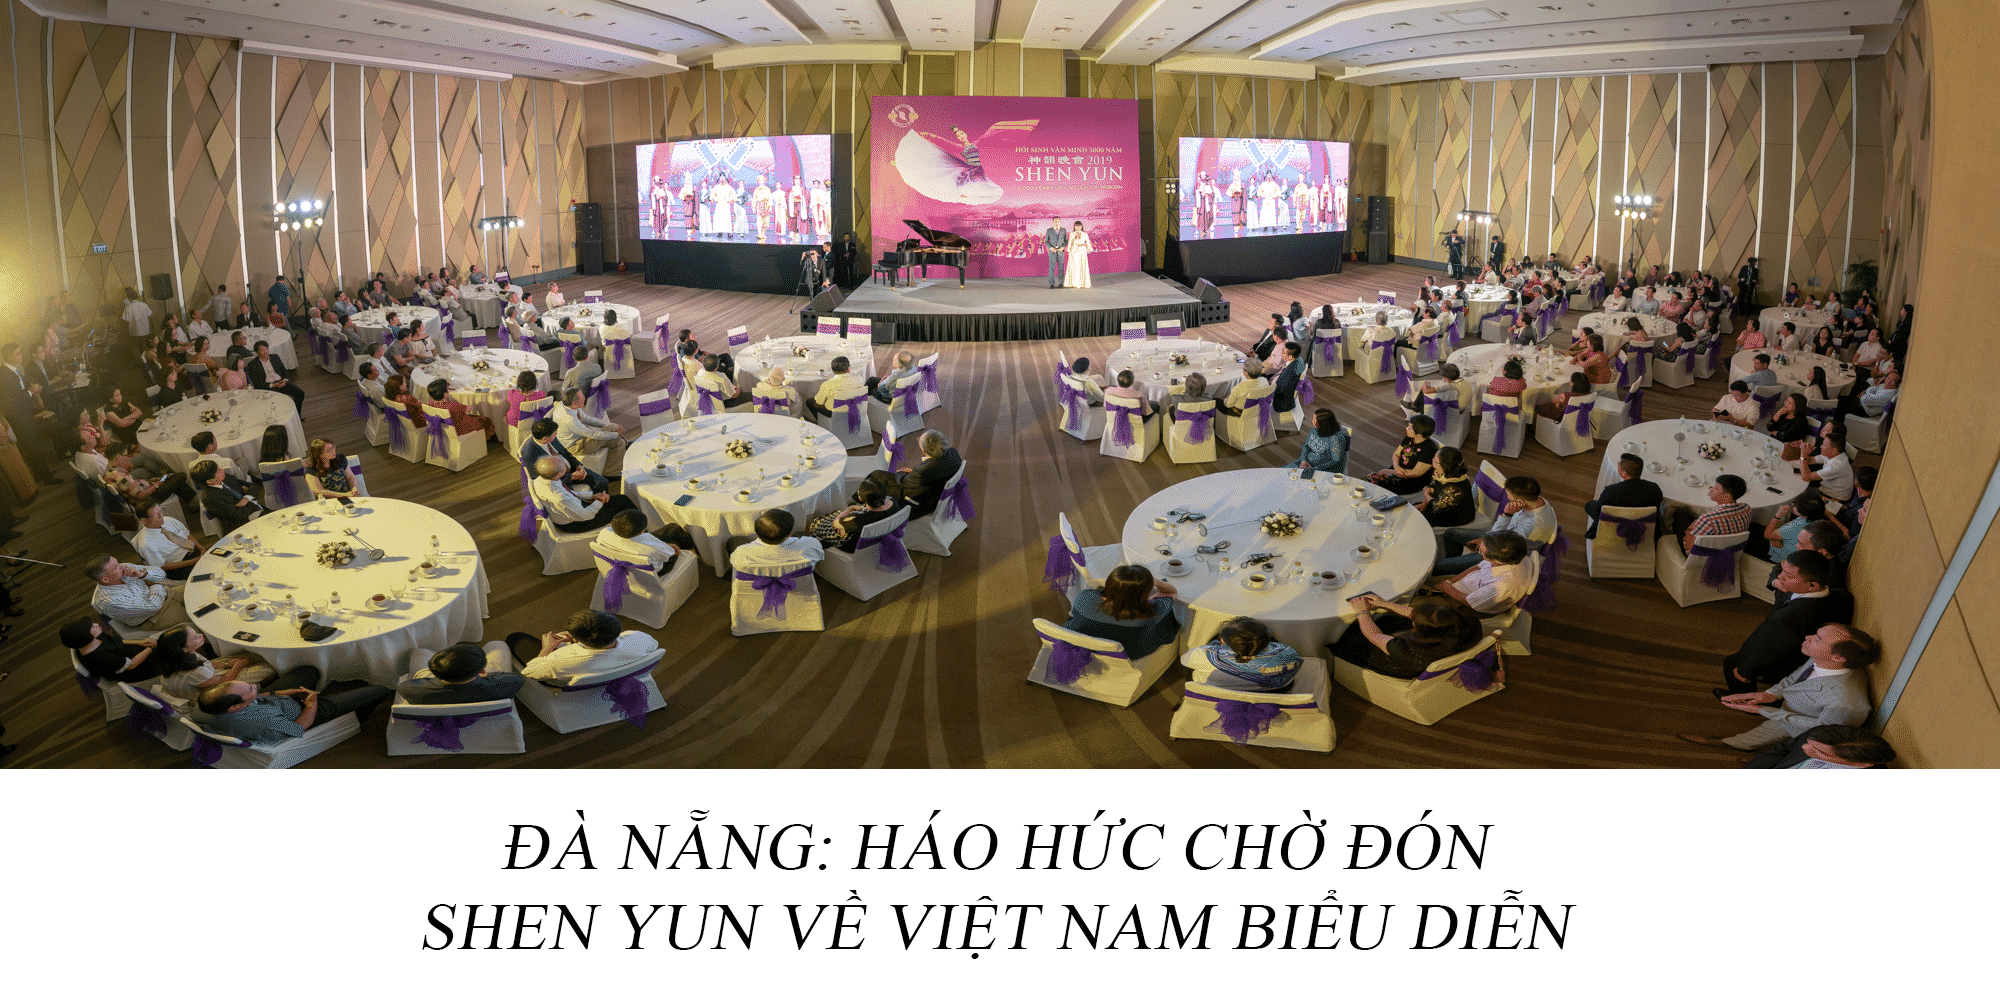 tiệc trà giới thiệu Shen Yun